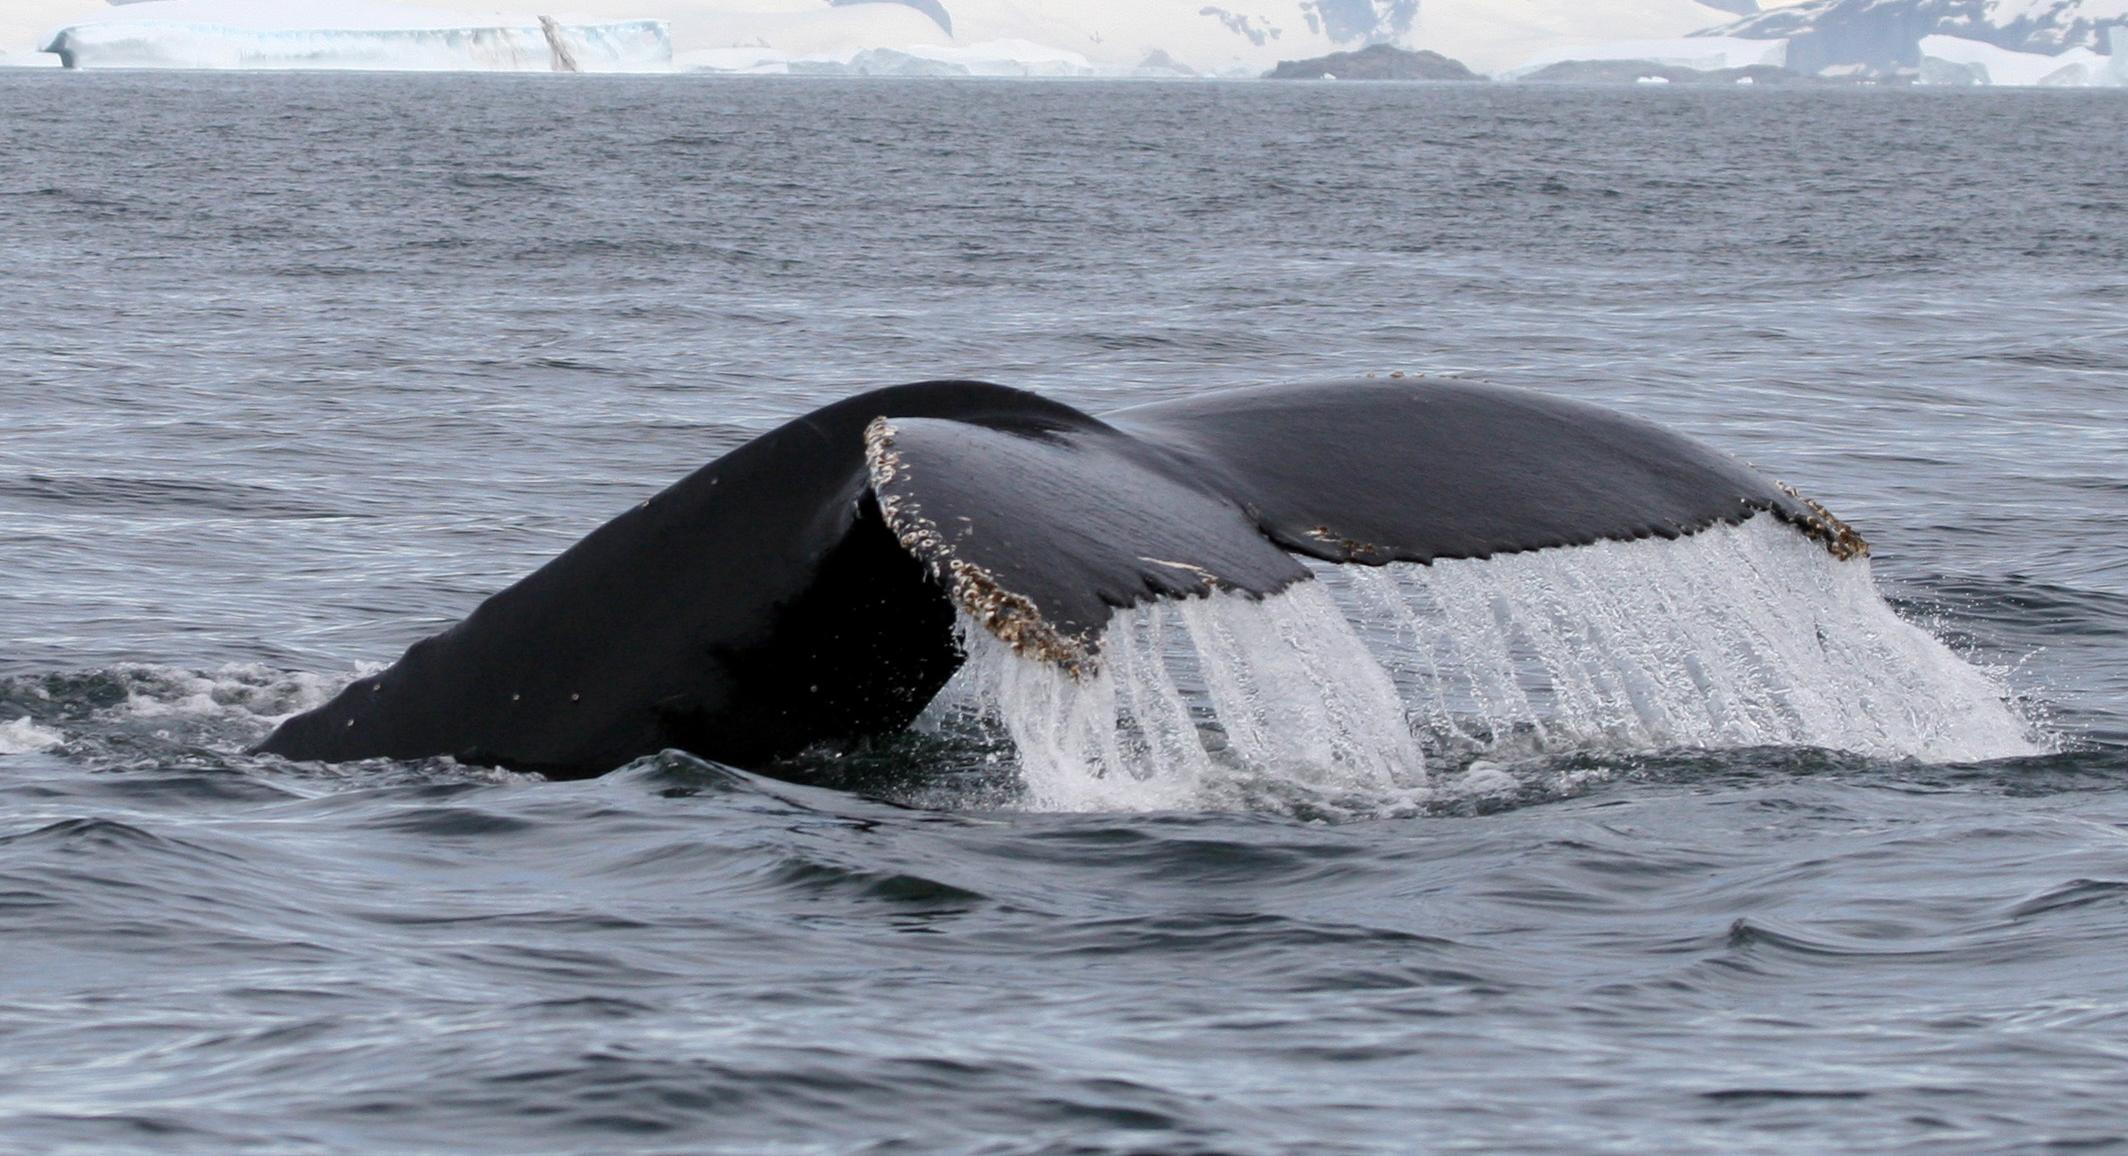 Se hvalene på Island på denne hvalsafarien i Breidafjord på halvøya Snæfellsnes.